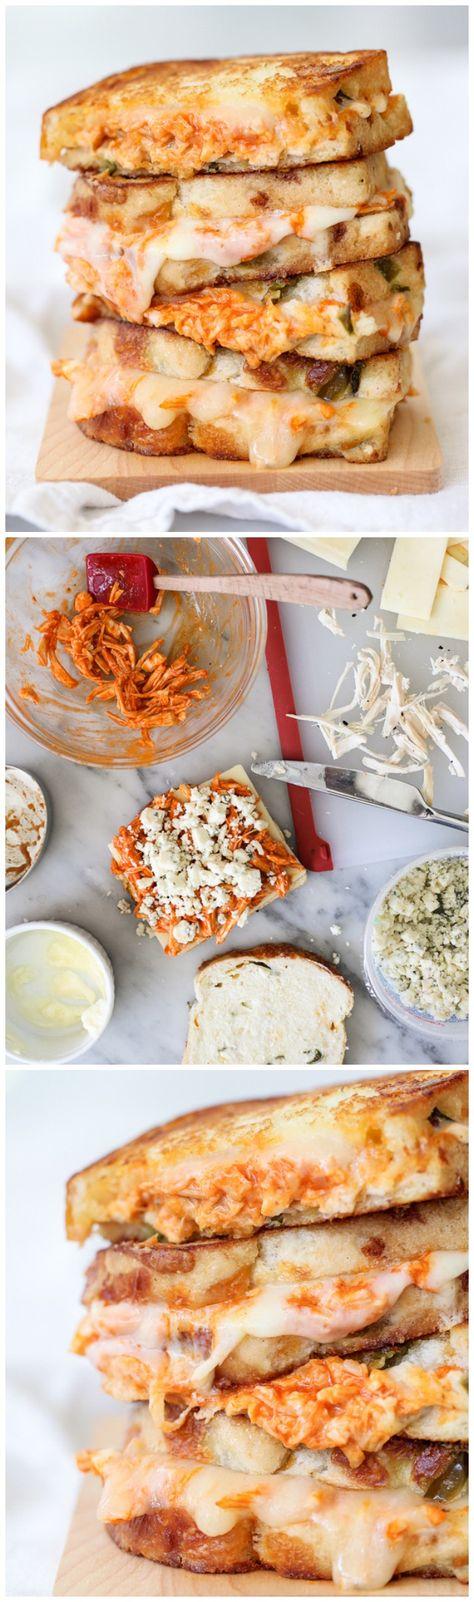 Buffalo Chicken Grilled Cheese Sandwich   foodiecrush.com #recipe